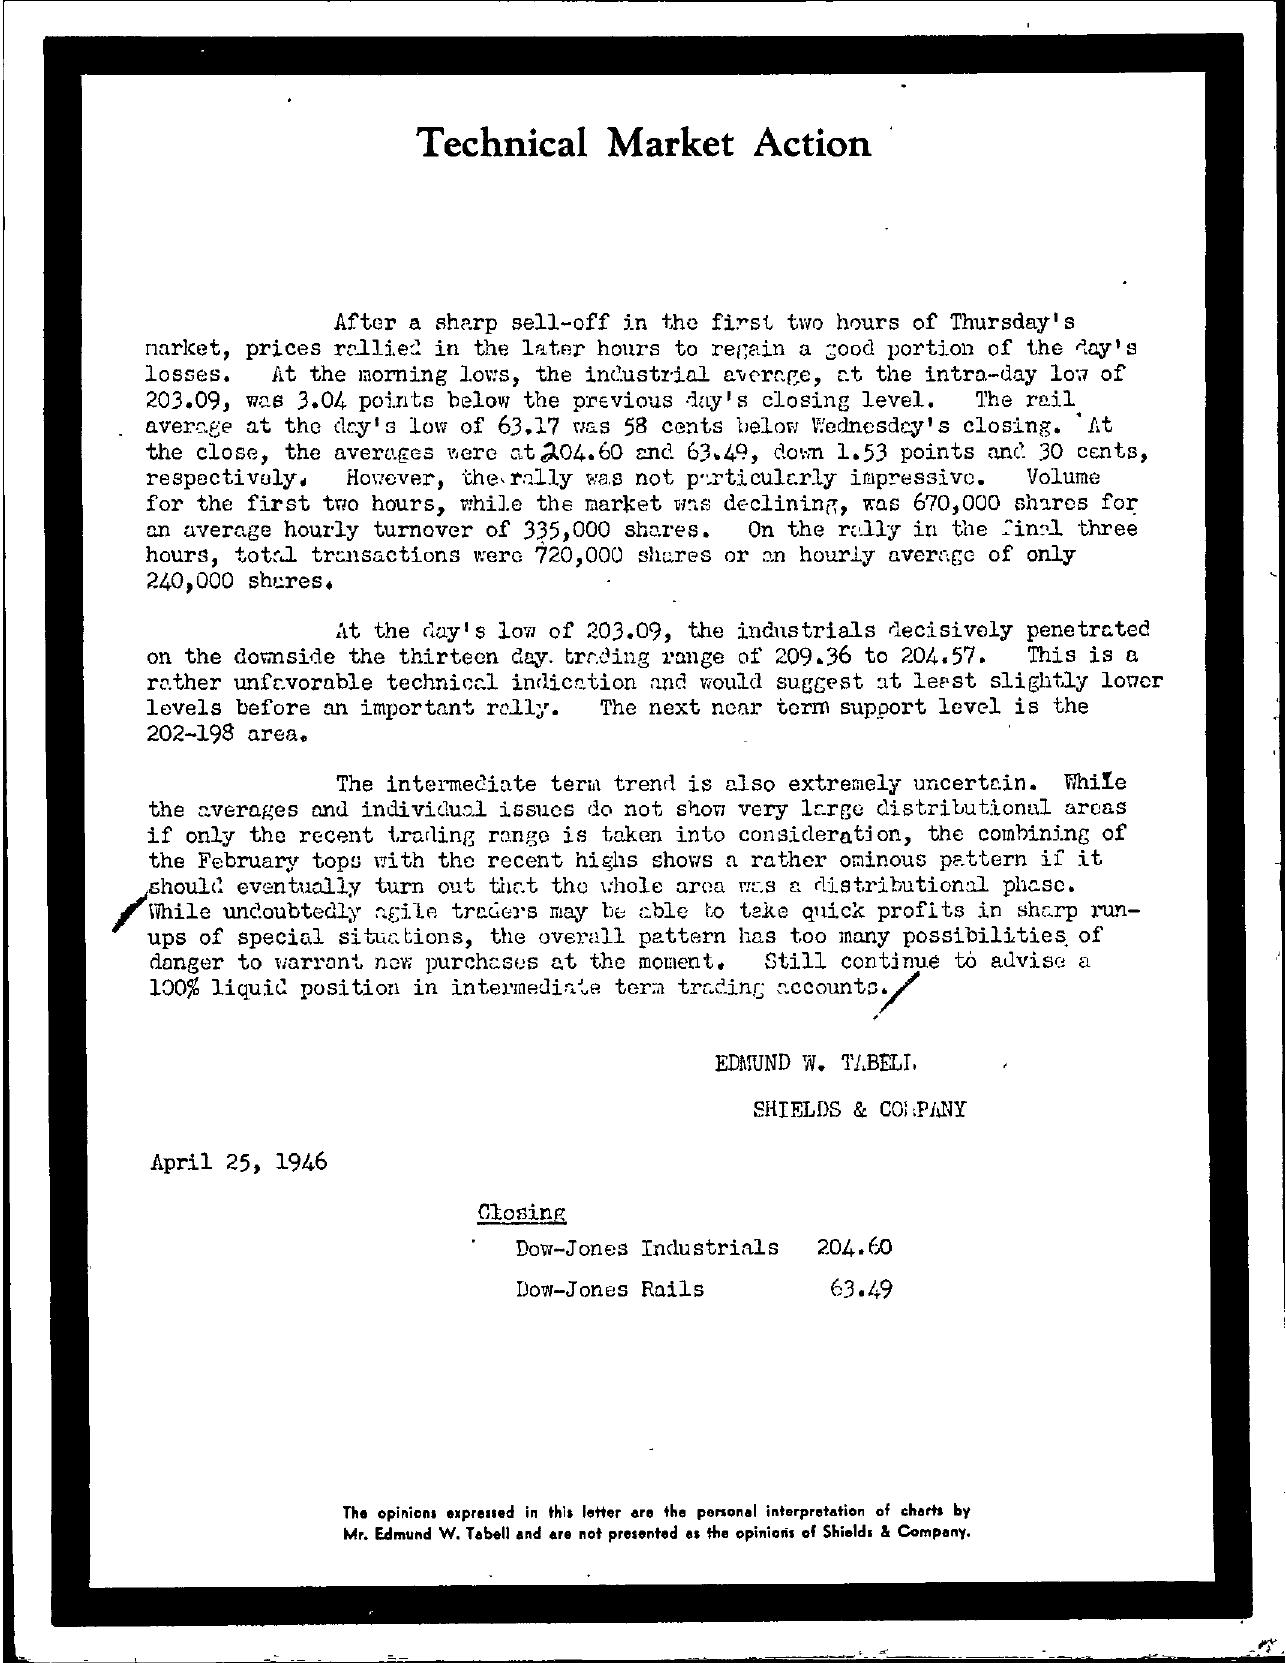 Tabell's Market Letter - April 25, 1946